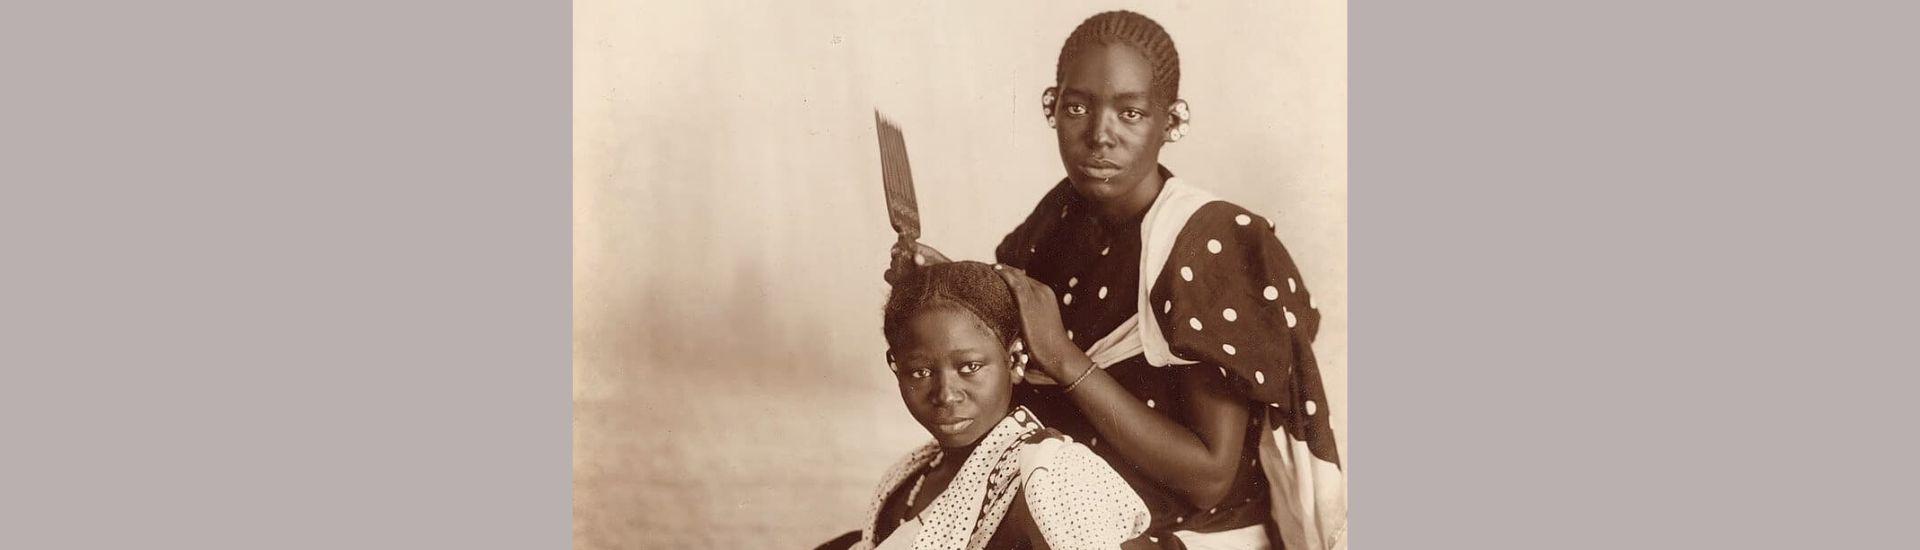 Coiffures africaines : le sens caché